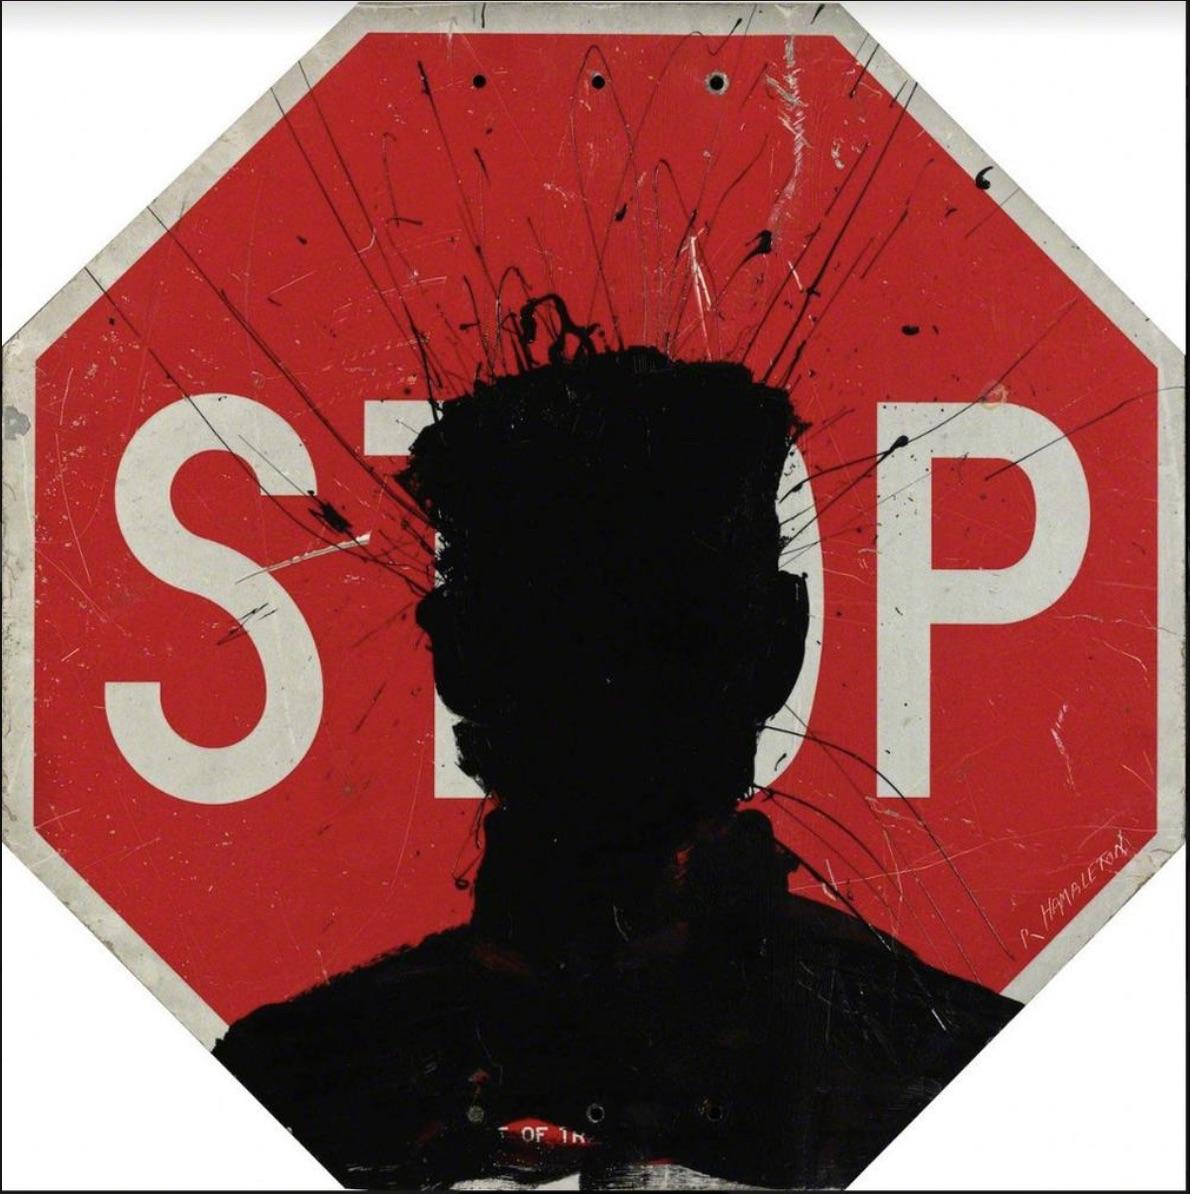 Stop Sign by Richard Hambleton